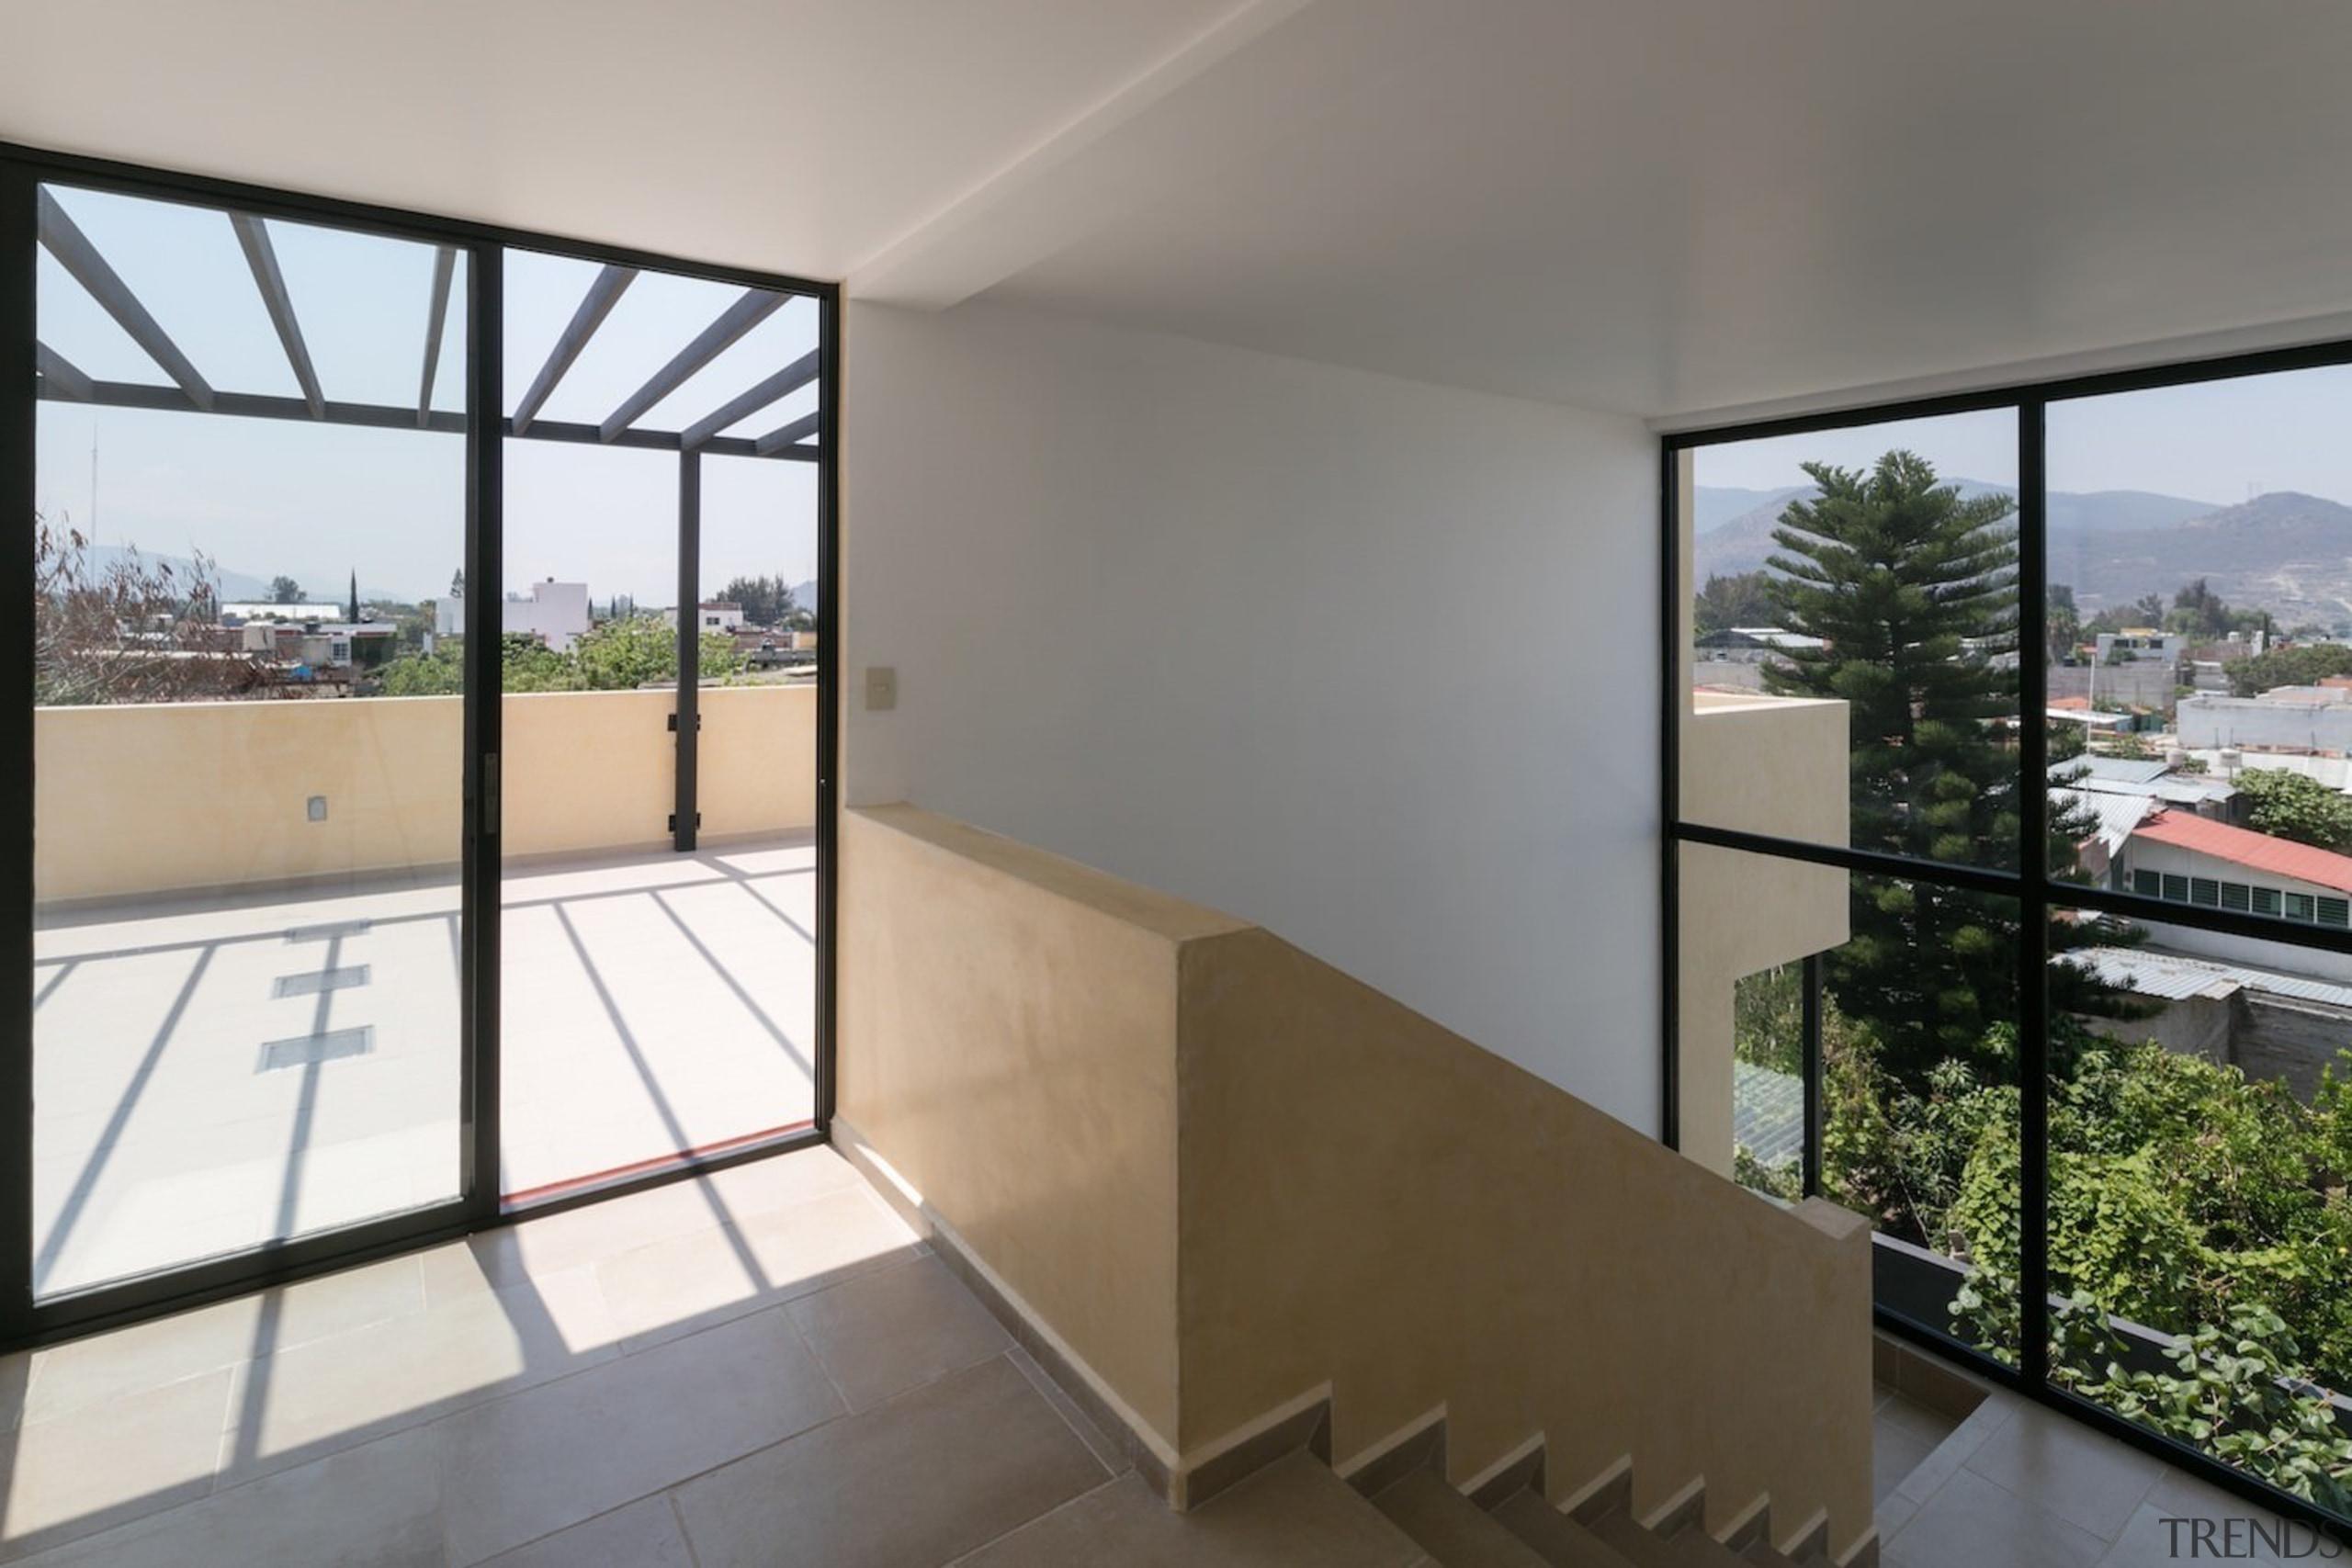 Architect: Espacio 18 ArquitecturaPhotography by Lorena Darquea apartment, architecture, balcony, condominium, daylighting, estate, handrail, house, interior design, property, real estate, window, gray, white